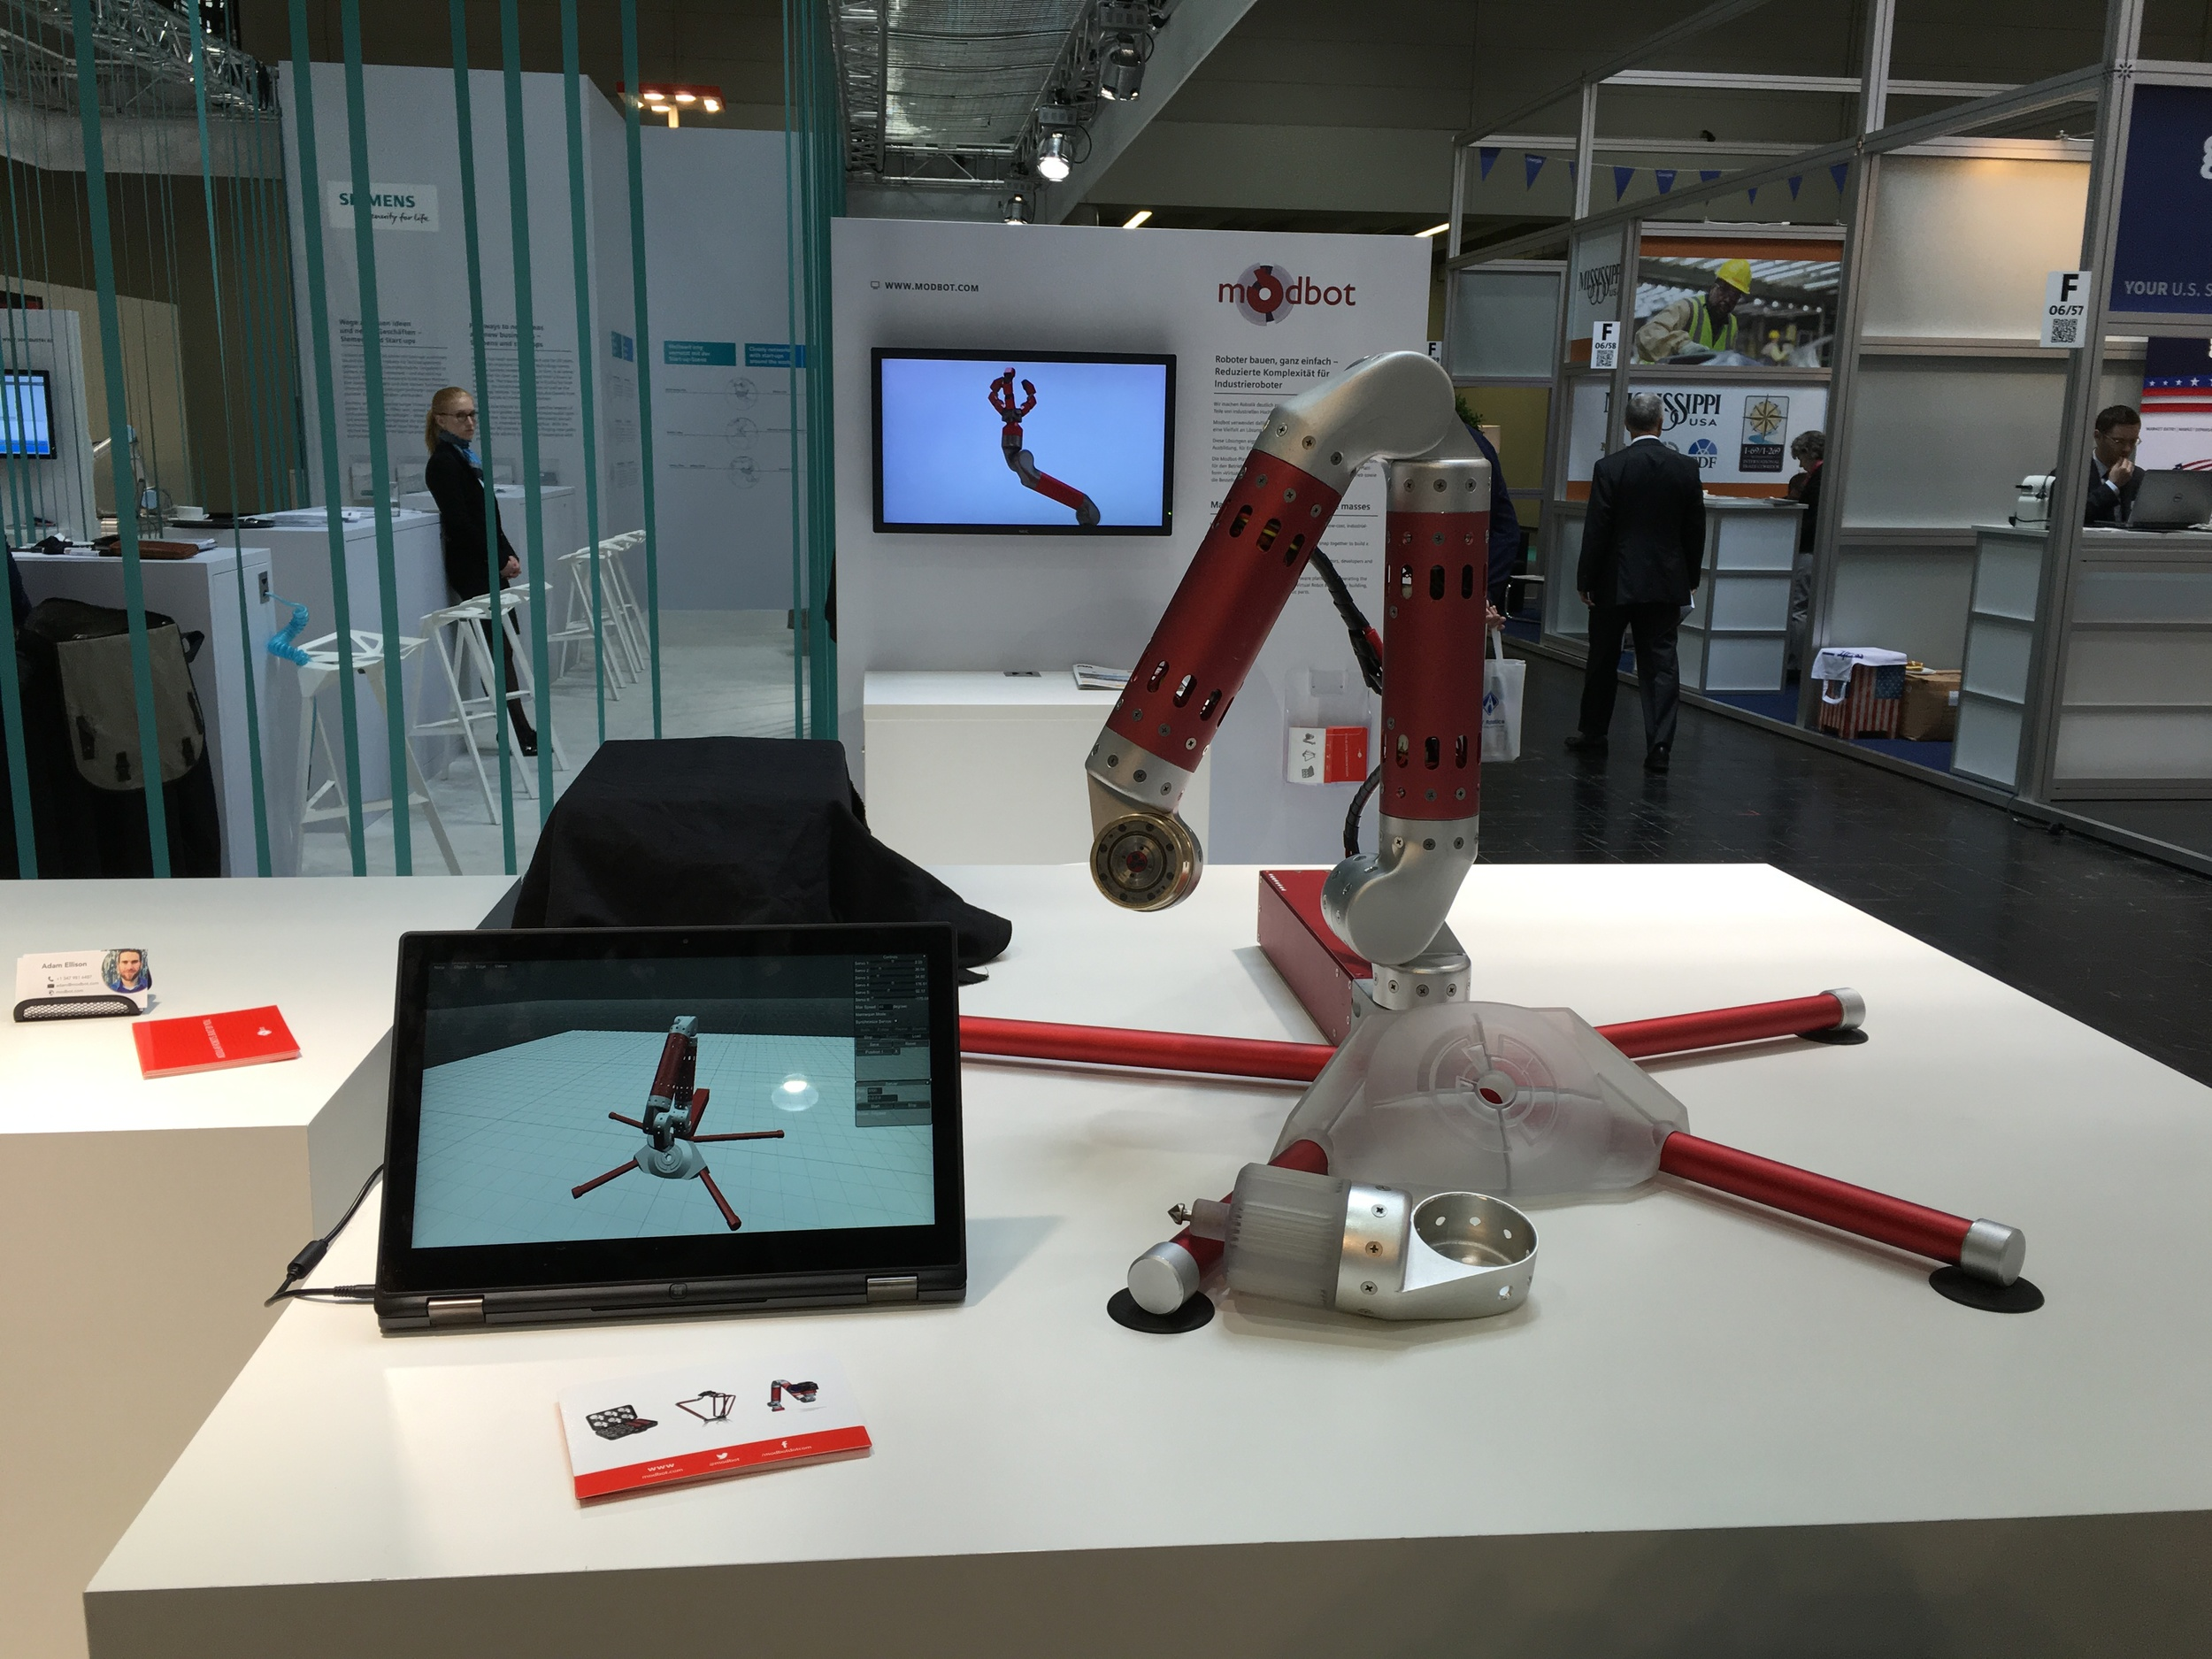 Modbot Alpha Robot Demo at Hannover Messe 2016 (Photo:Shawn Schaerer)